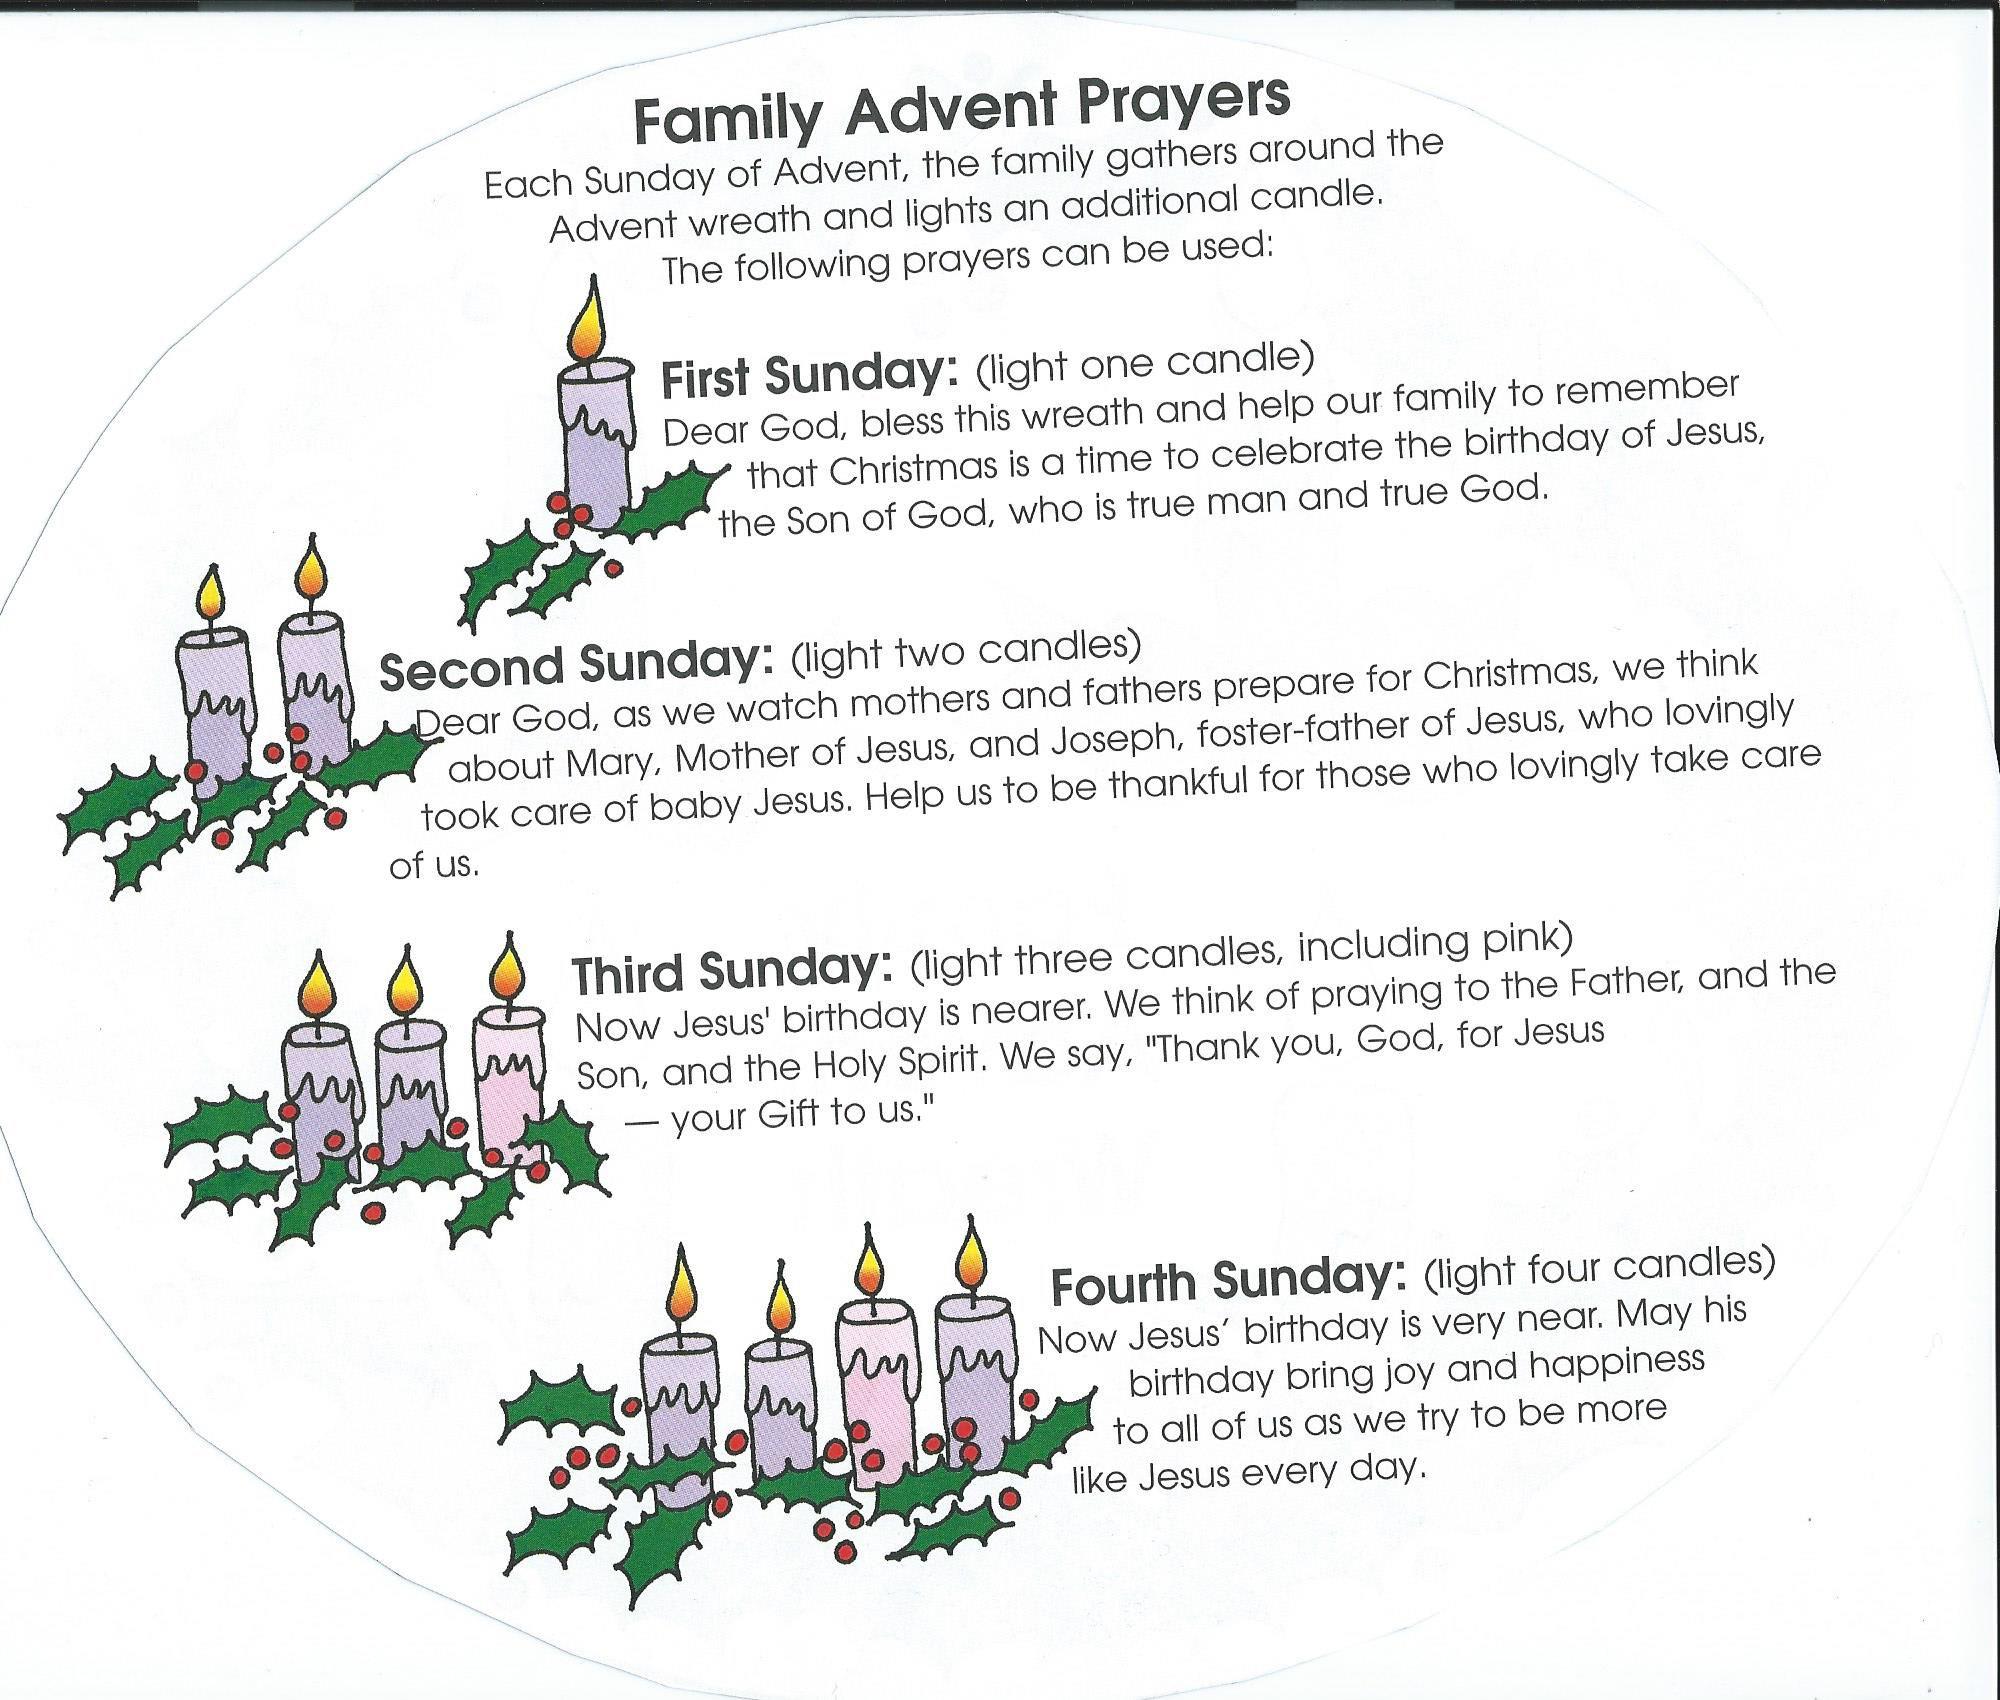 Family Advent Prayers